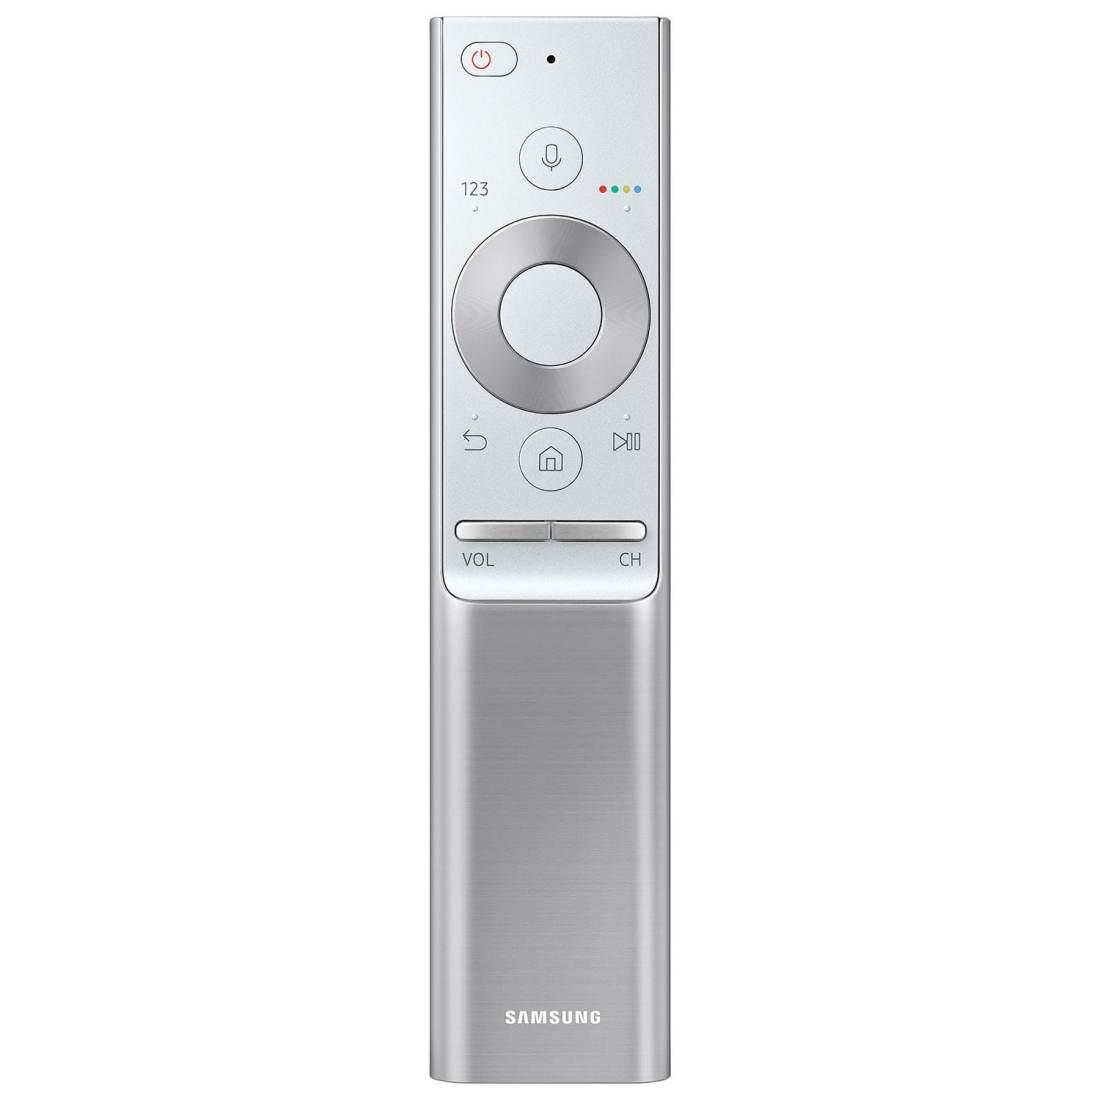 Samsung Qn65q7famfxzc 65 Quot 4k Uhd Hdr Qled Tizen Smart Tv